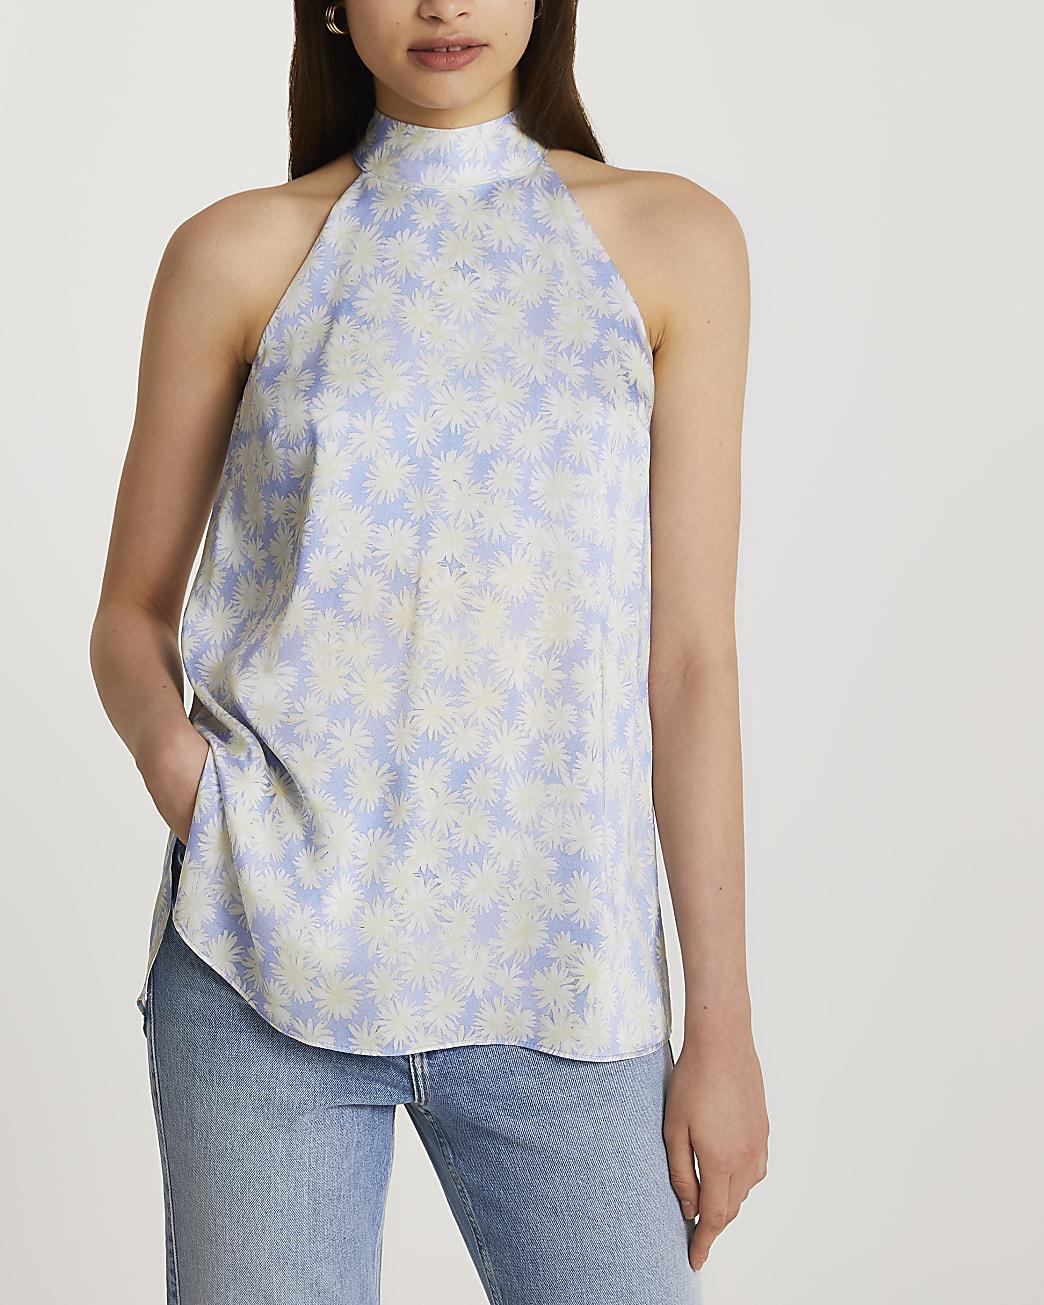 Purple halter neck floral top